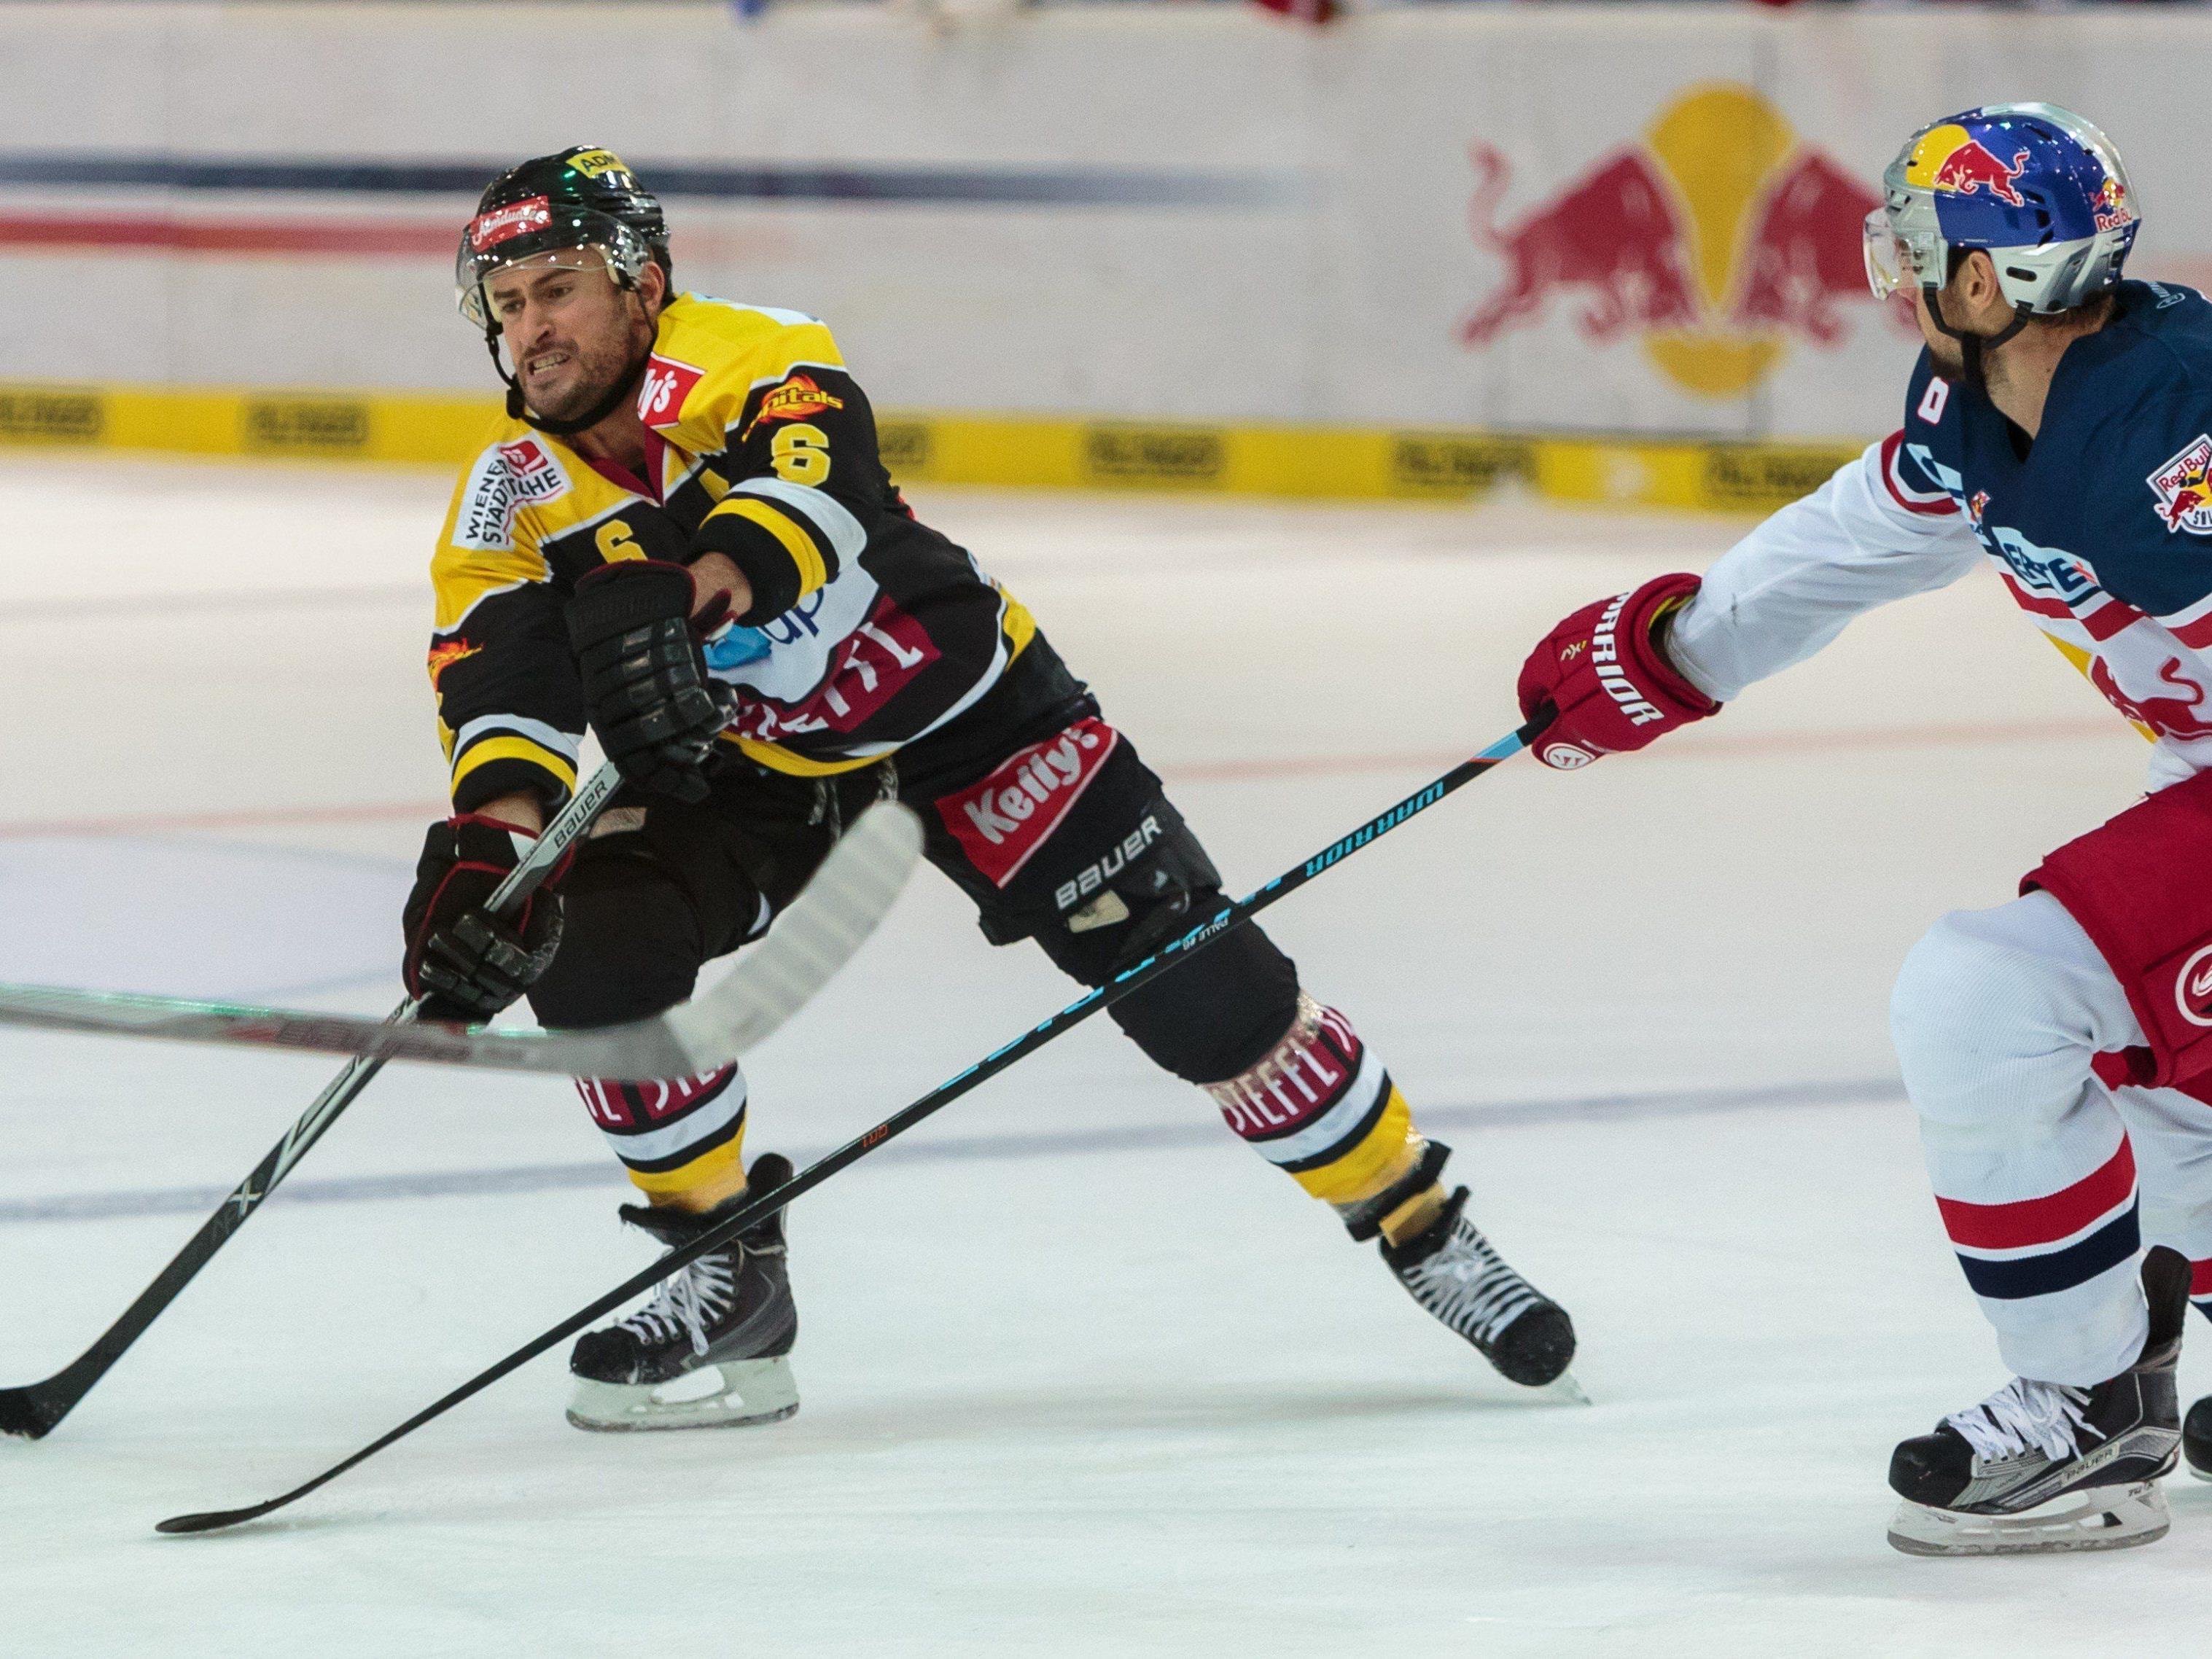 Vienna Capitals Spieler Rafael Rotter wurde gesperrt.